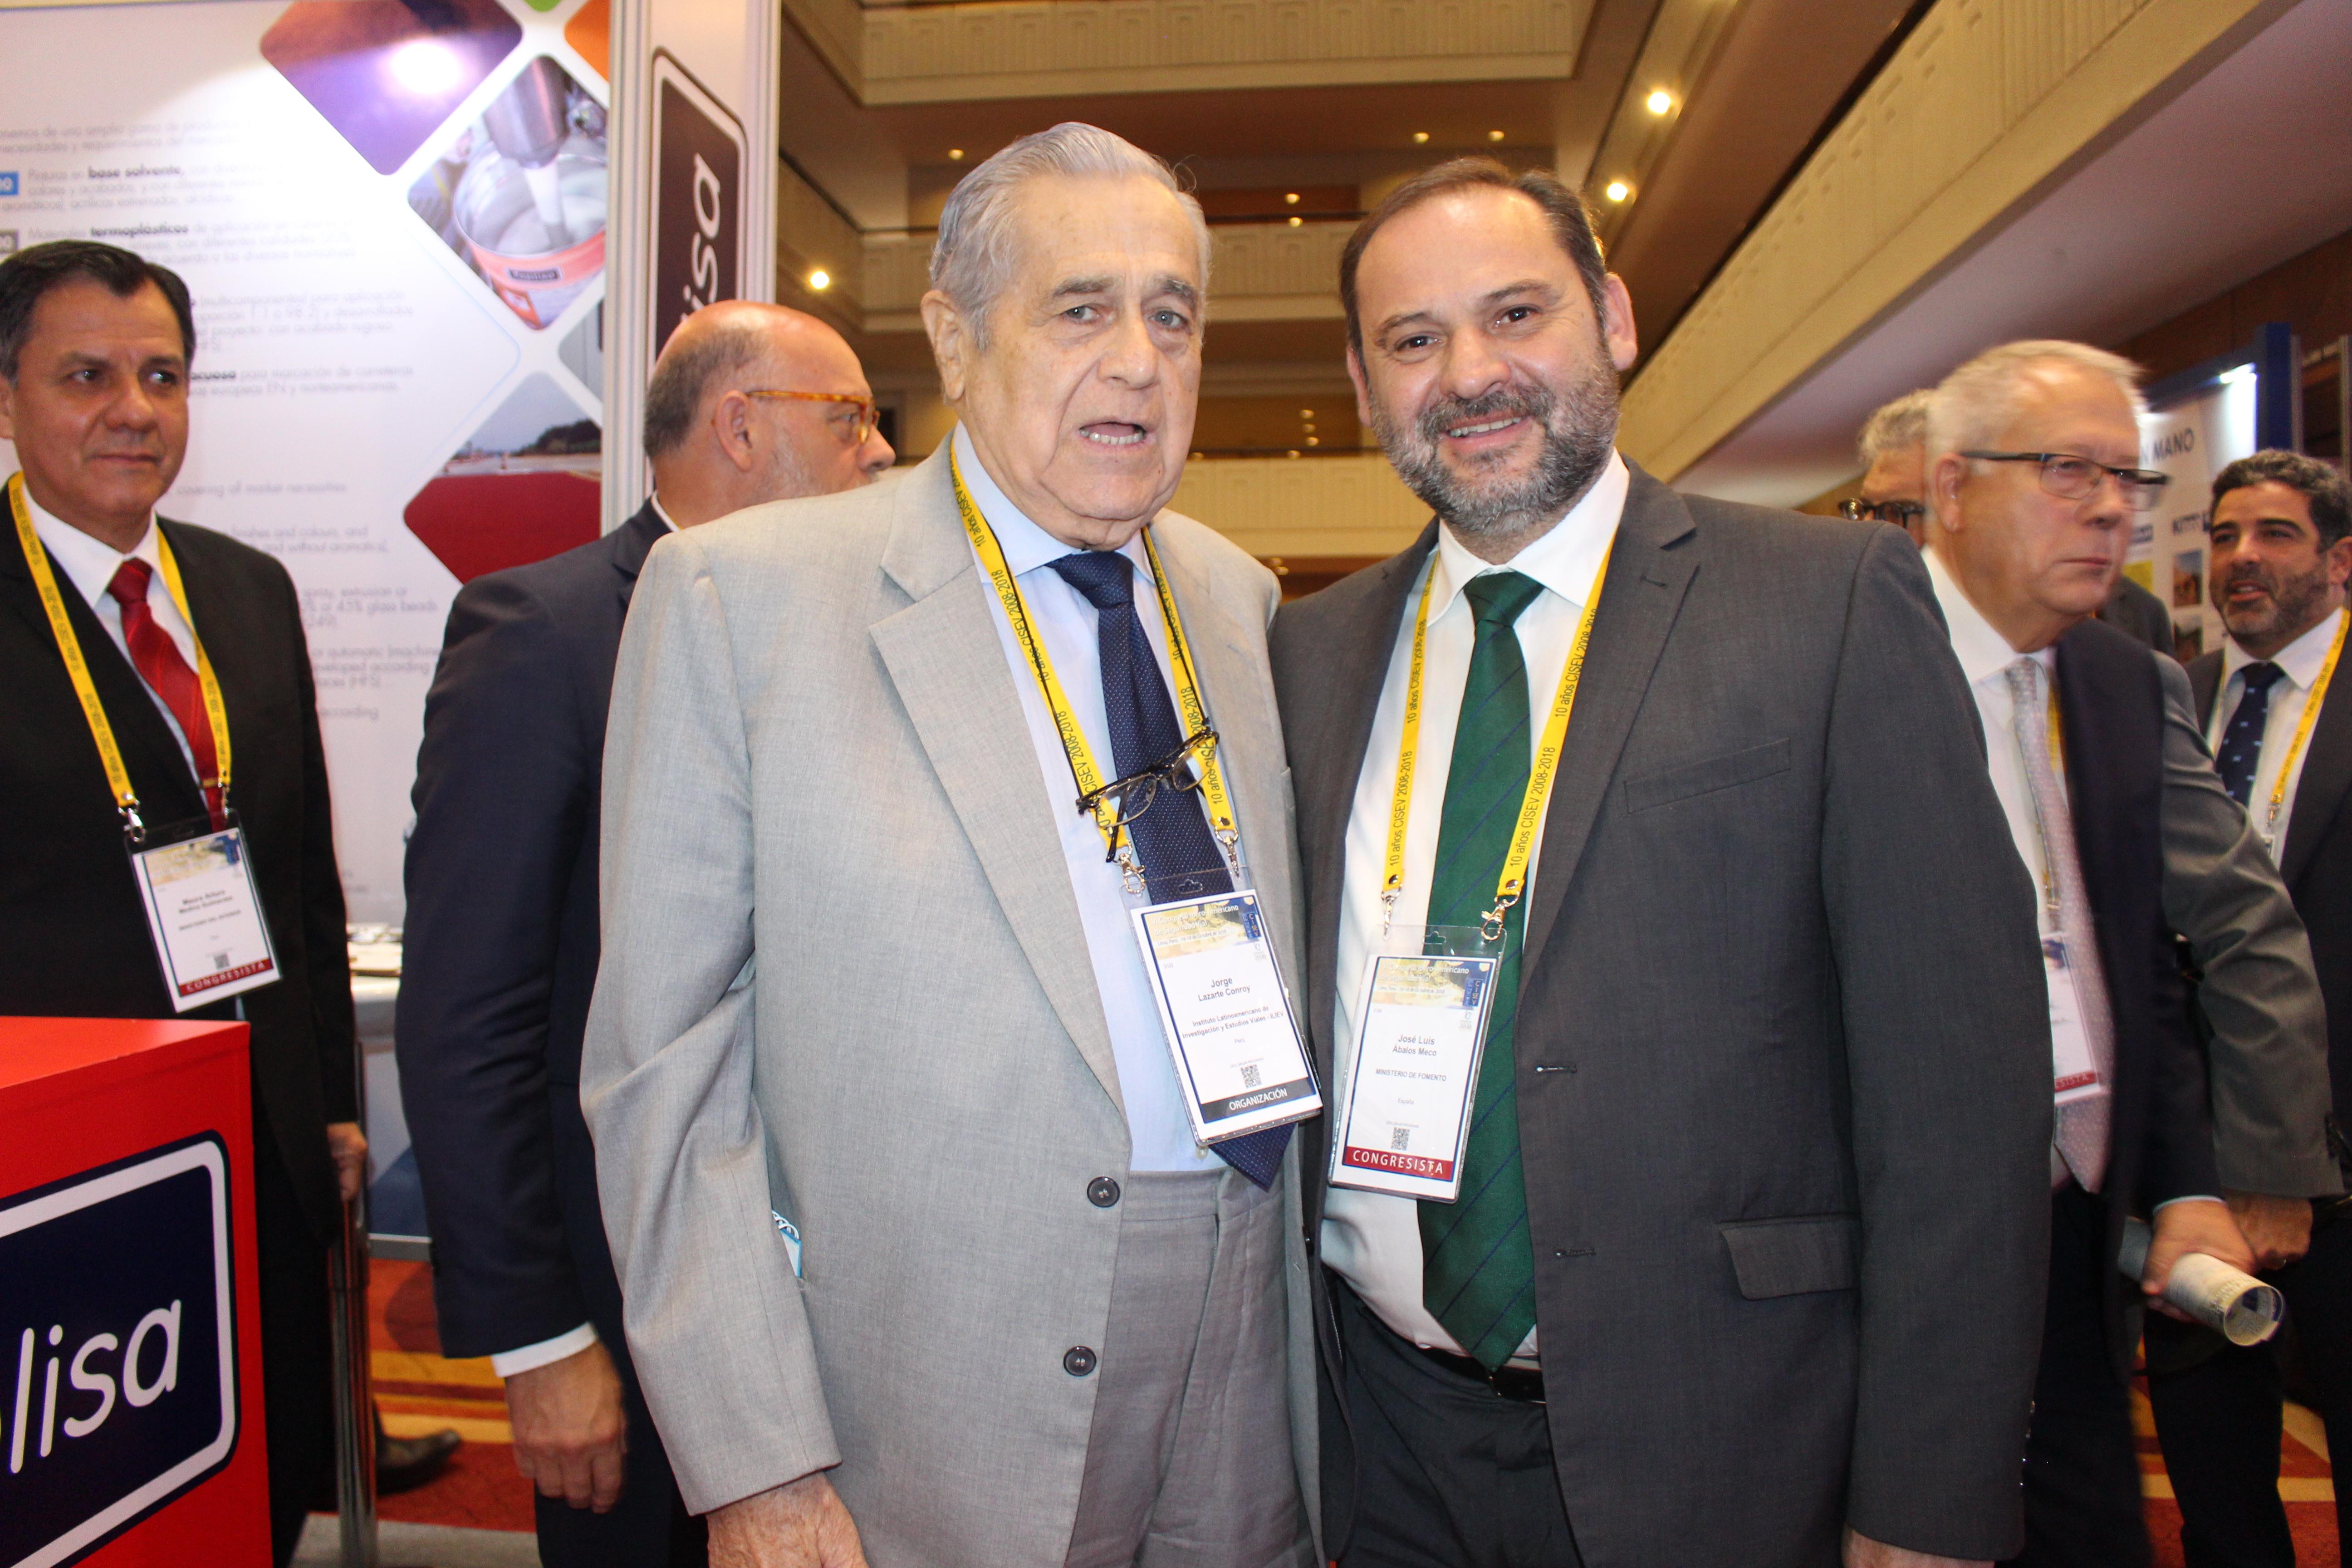 Mº FOMENTO ESPAÑA VISITA STAND FAPLISA VI CISEV 16_10_2018 (1)